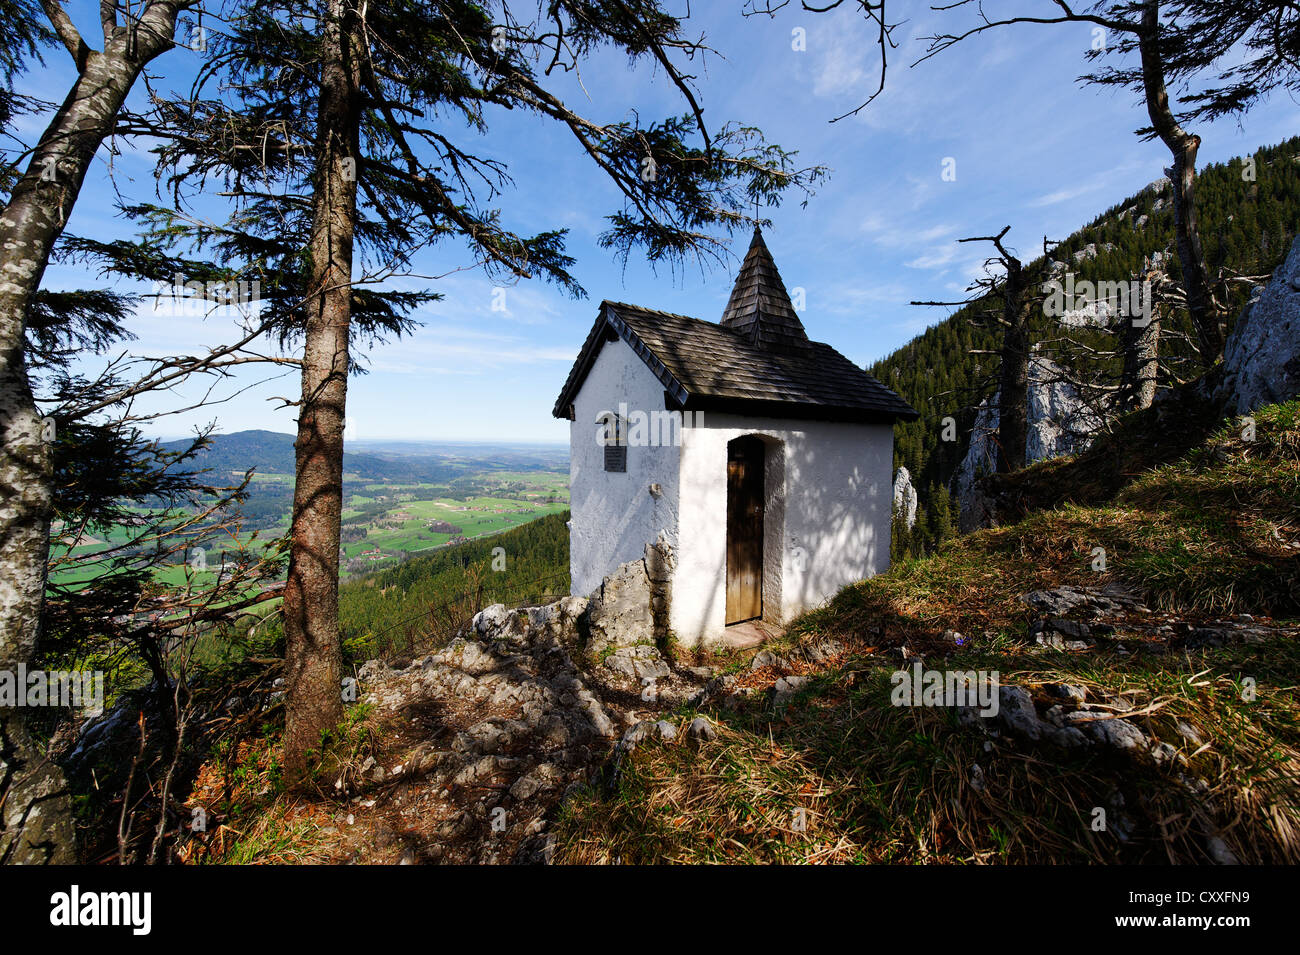 Chapel on Kesselalm alp, Breitenstein mountain, near Fischbachau, Leitzachtal valley, Upper Bavaria, Bavaria - Stock Image